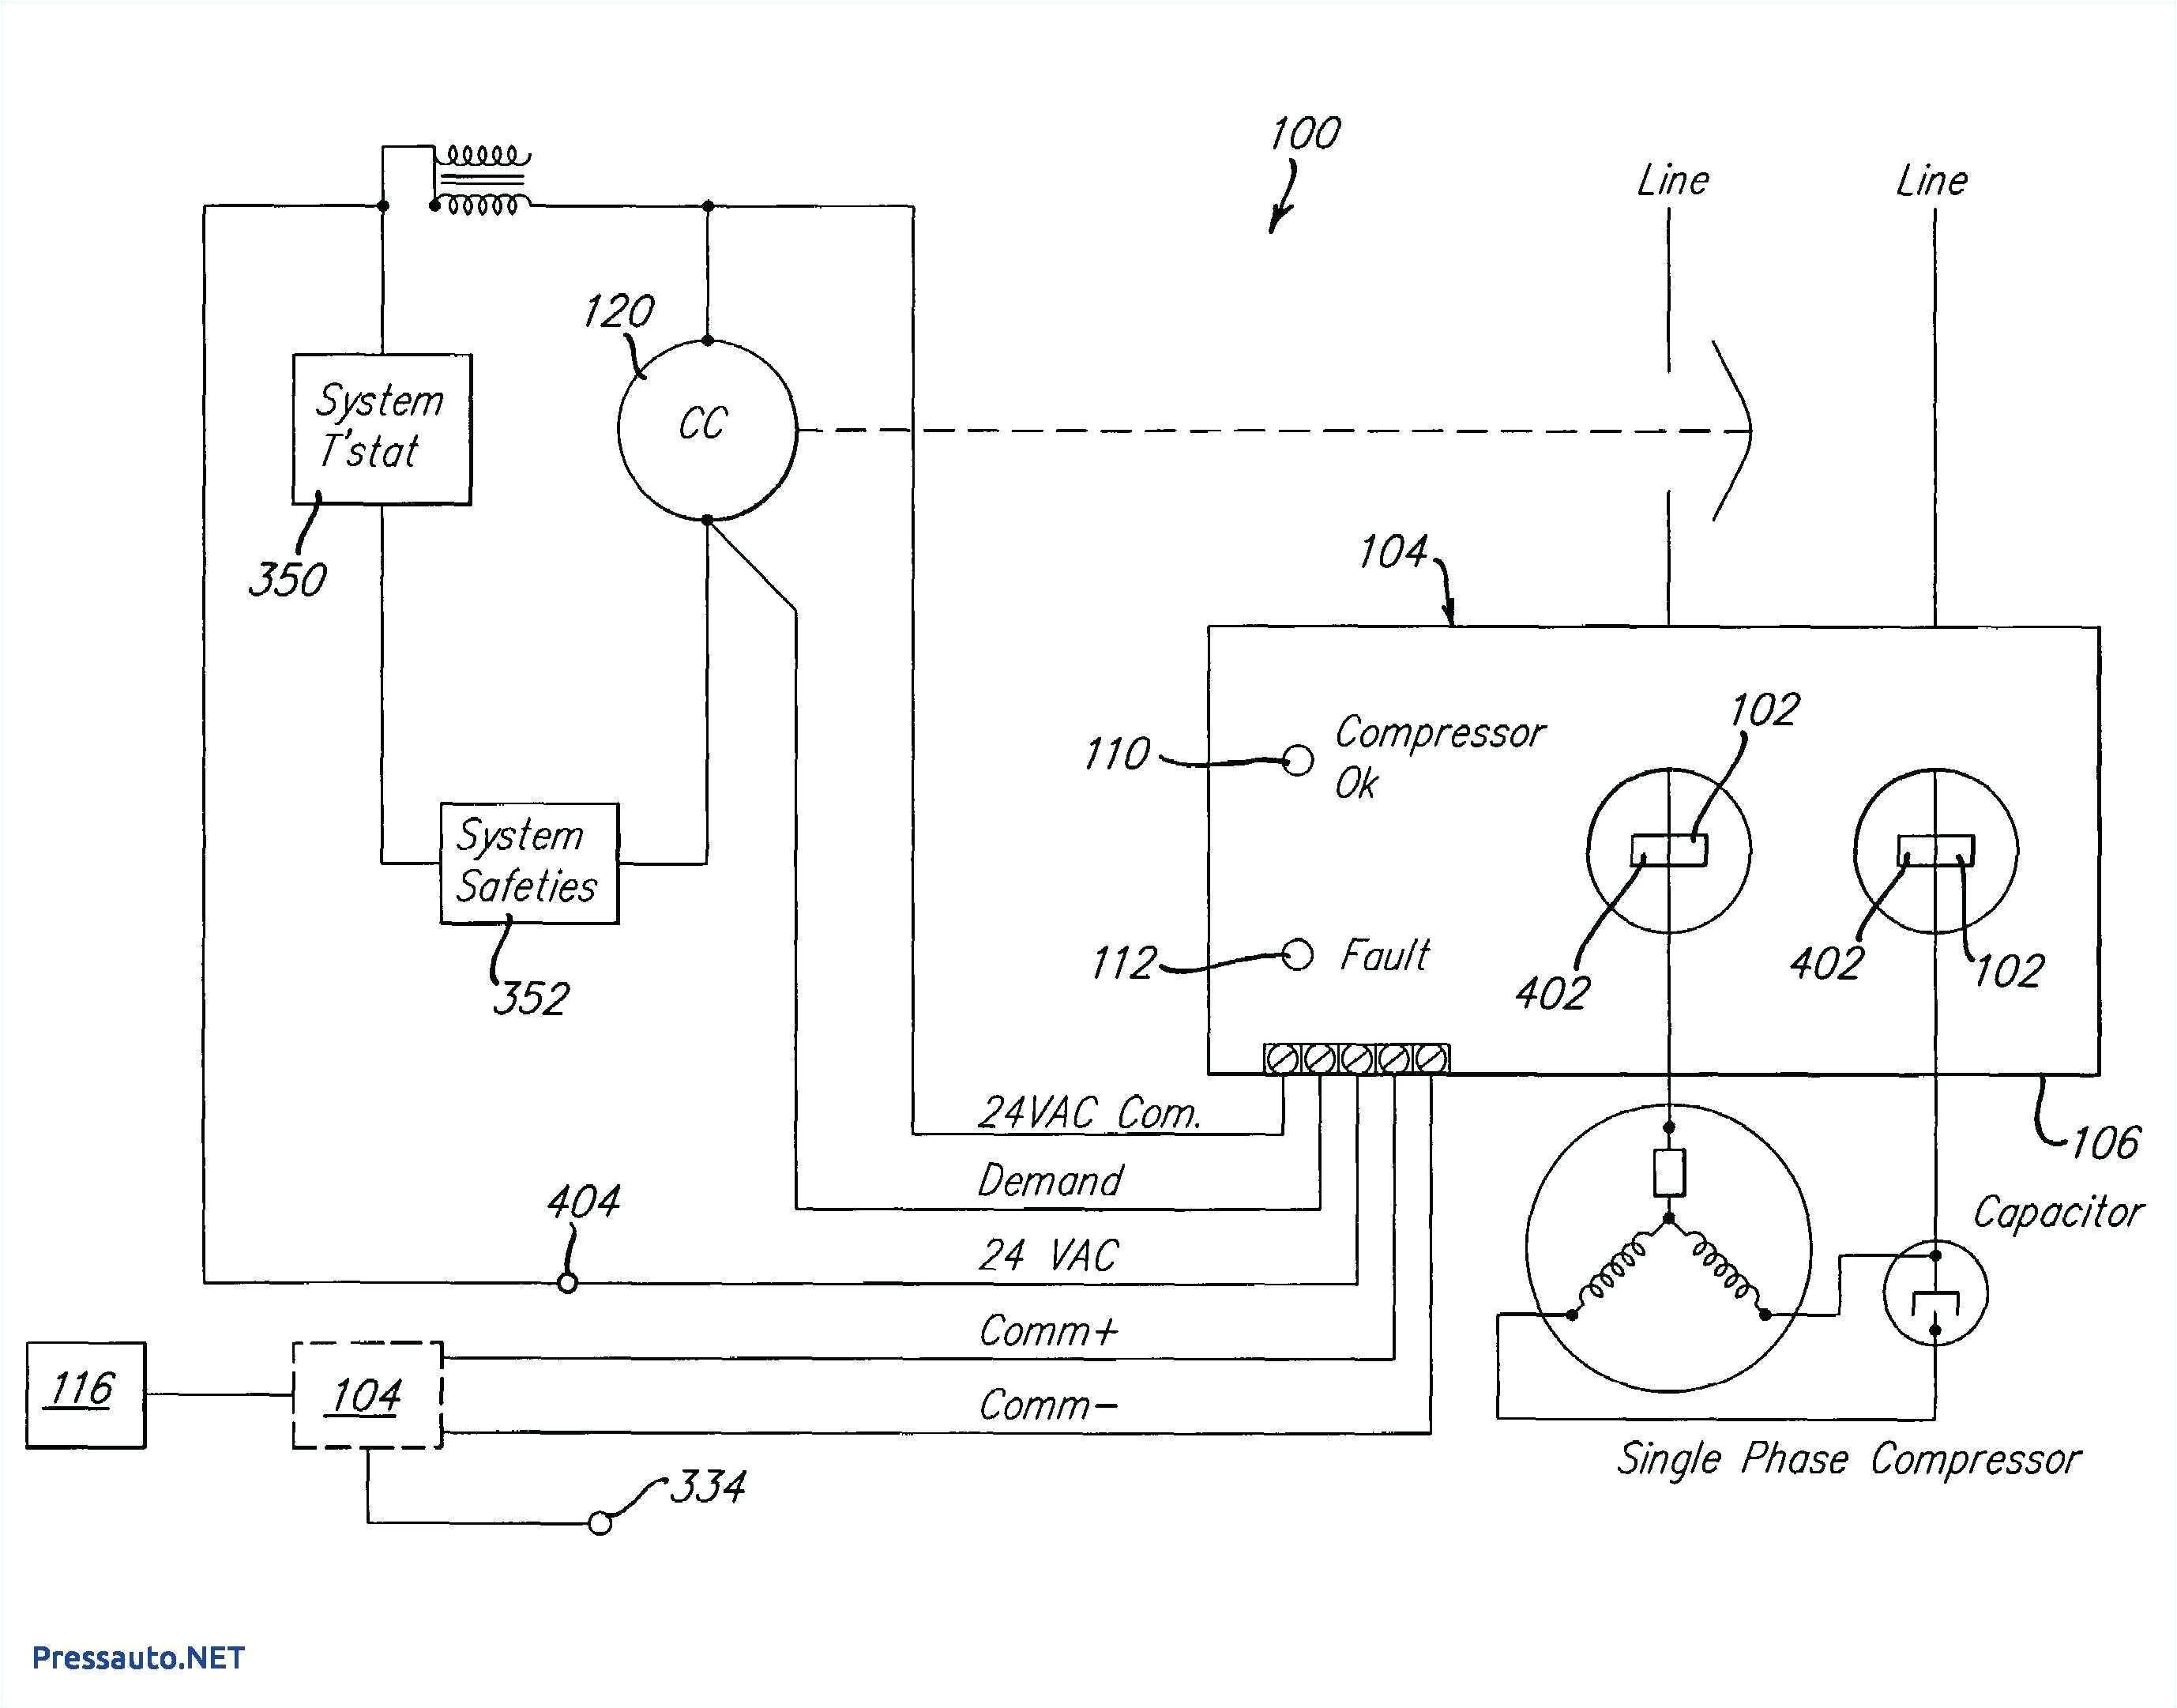 copeland single phase compressor wiring diagram best of copeland pressor cross reference chart unique part winding start jpg